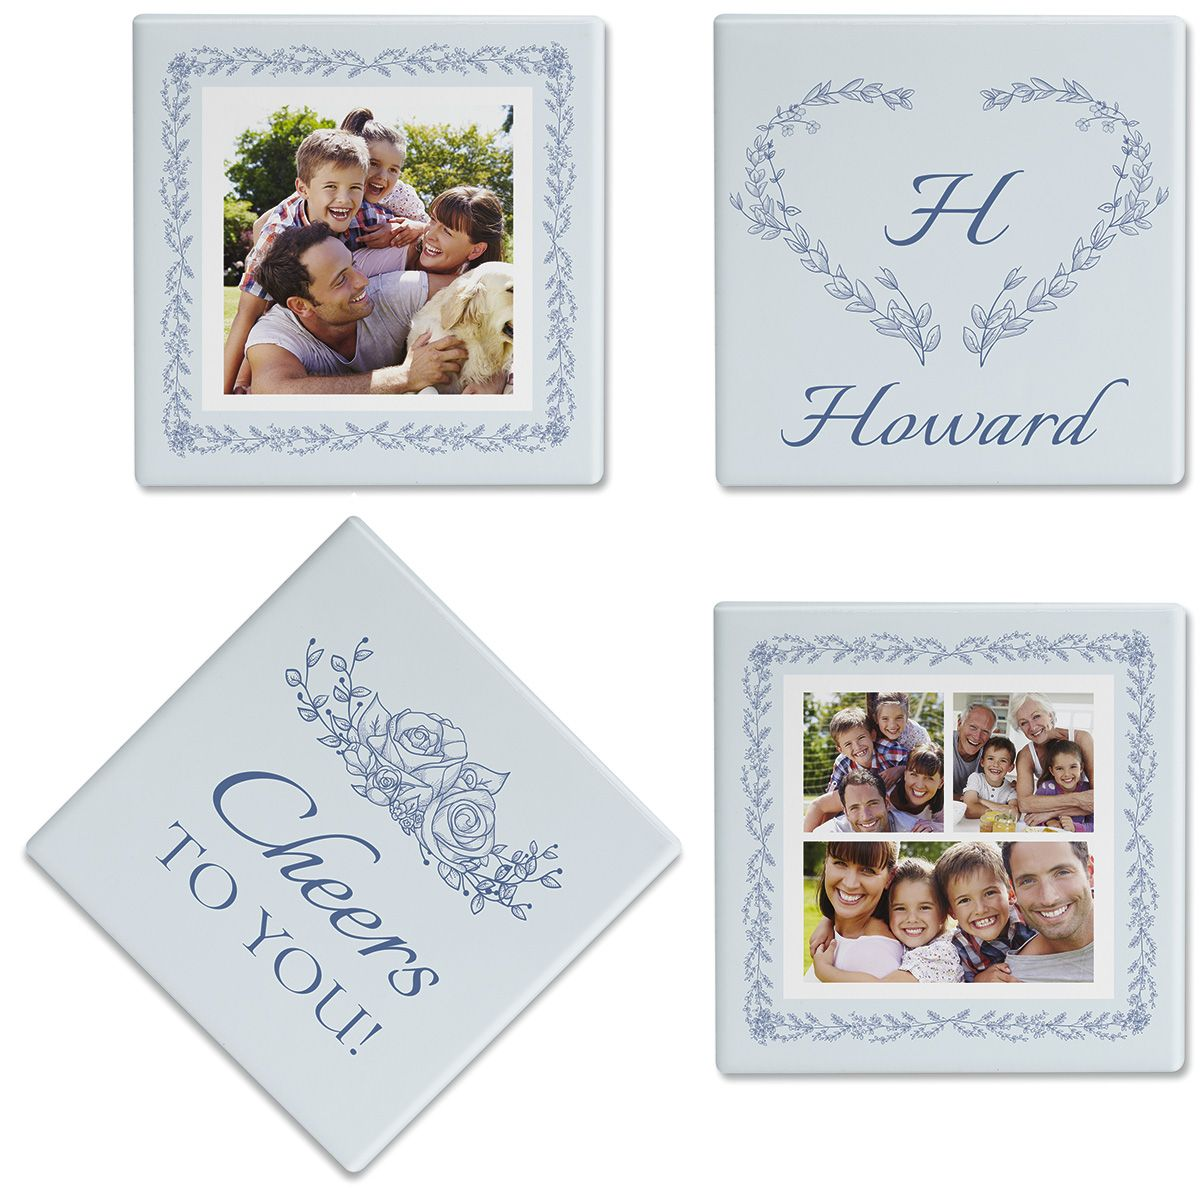 Laurel Cheers Photo Coasters